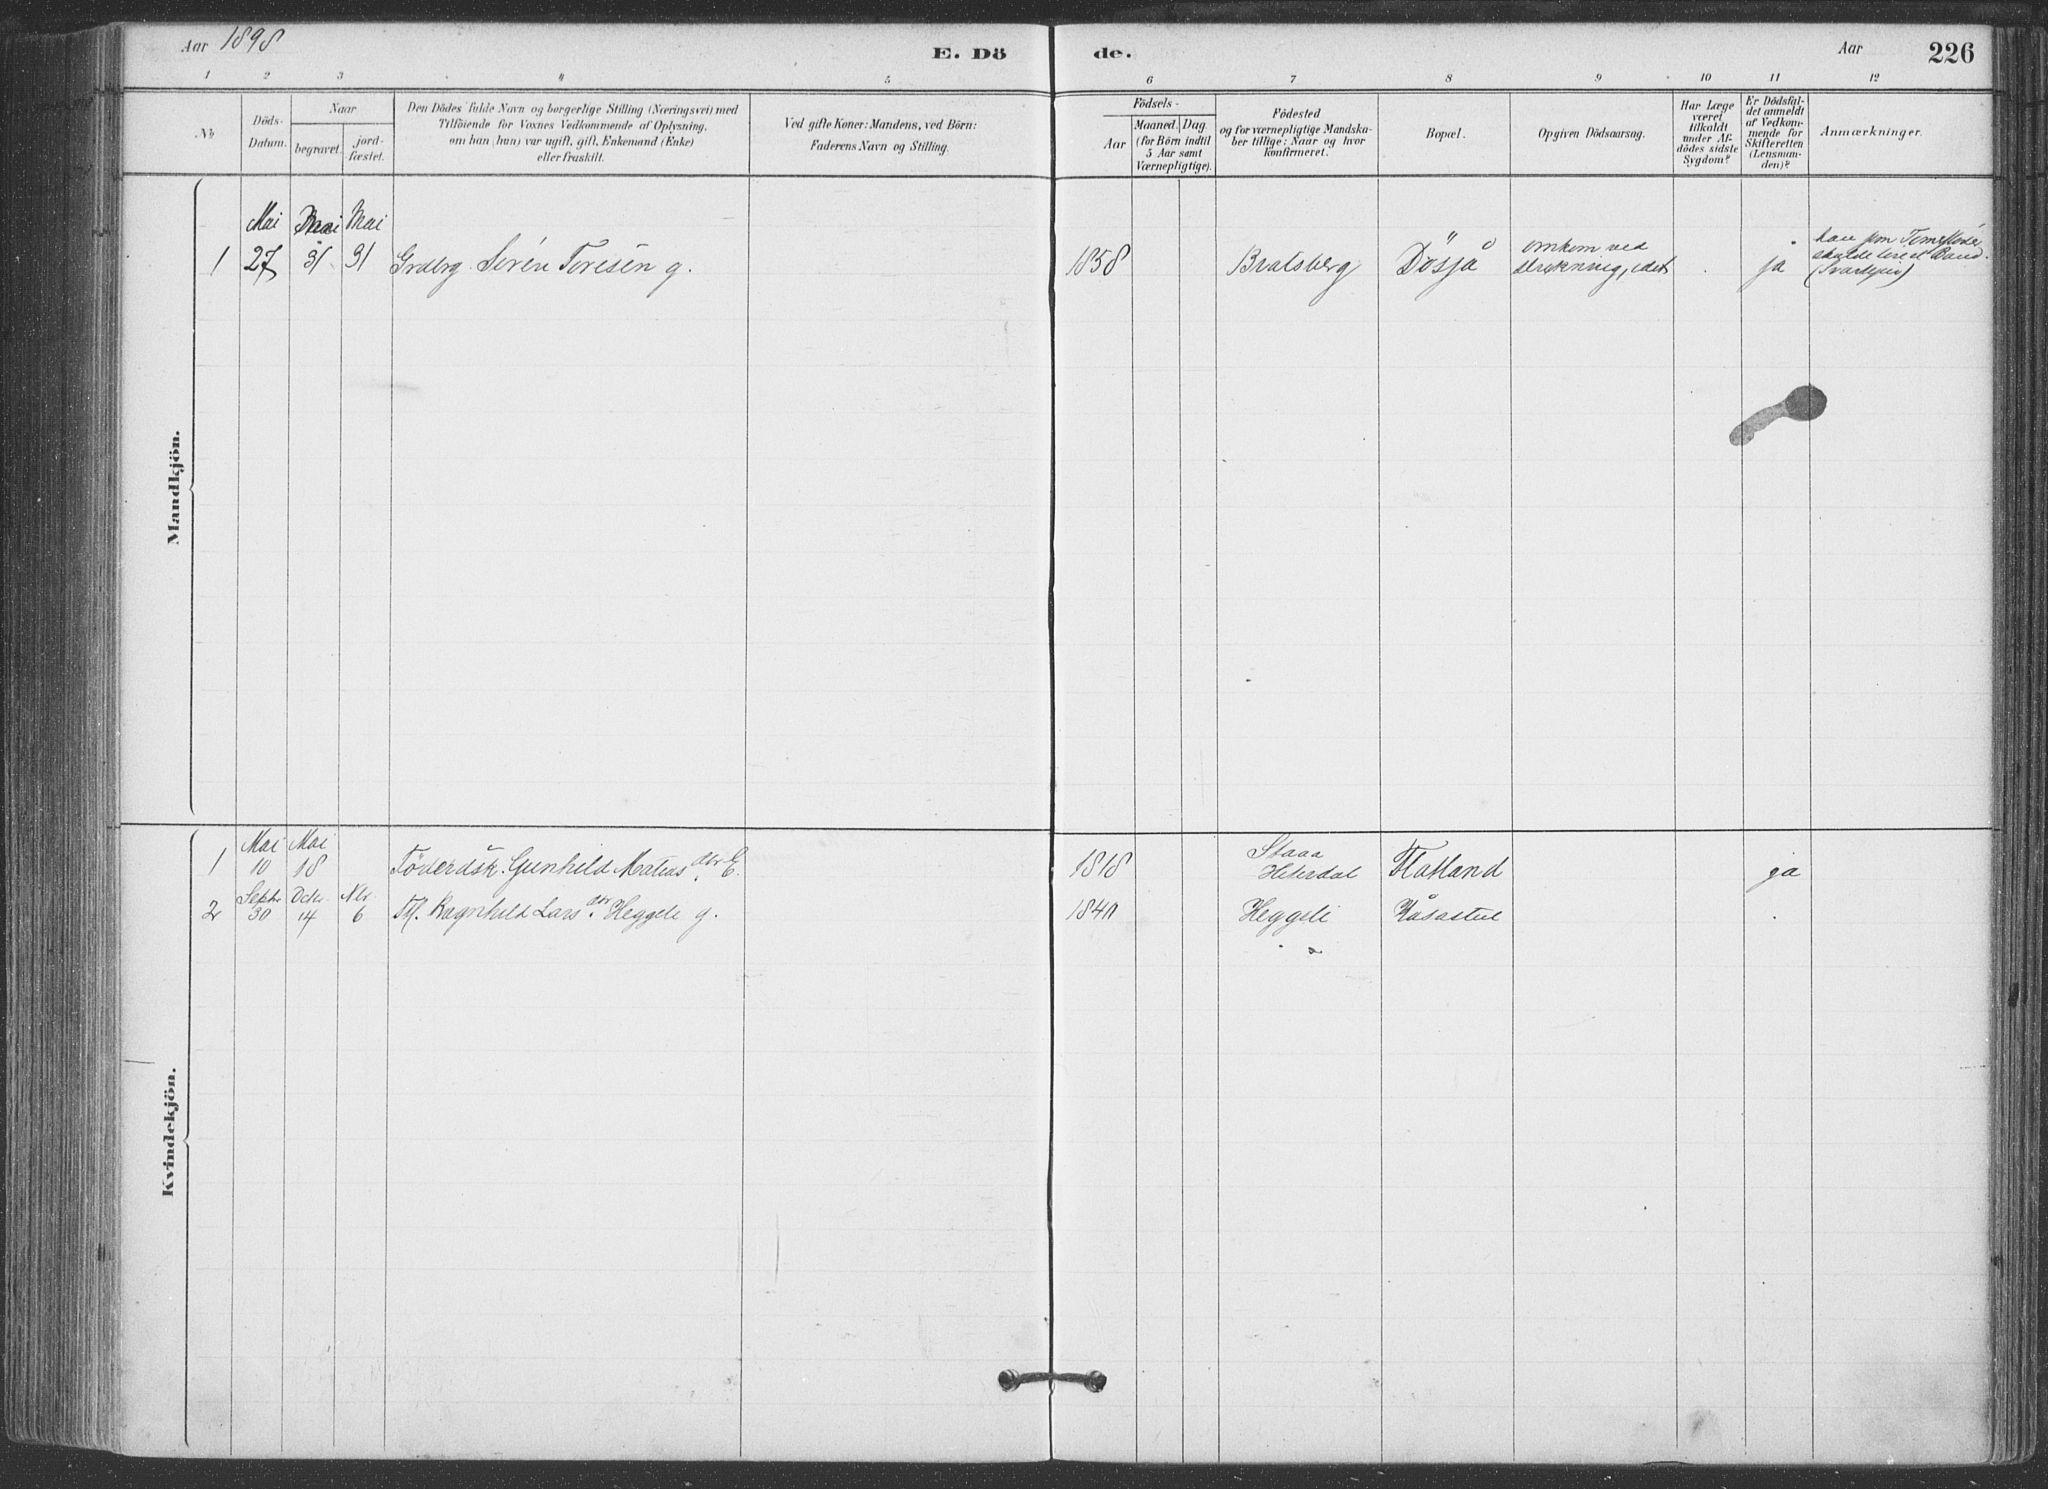 SAKO, Hjartdal kirkebøker, F/Fa/L0010: Ministerialbok nr. I 10, 1880-1929, s. 226